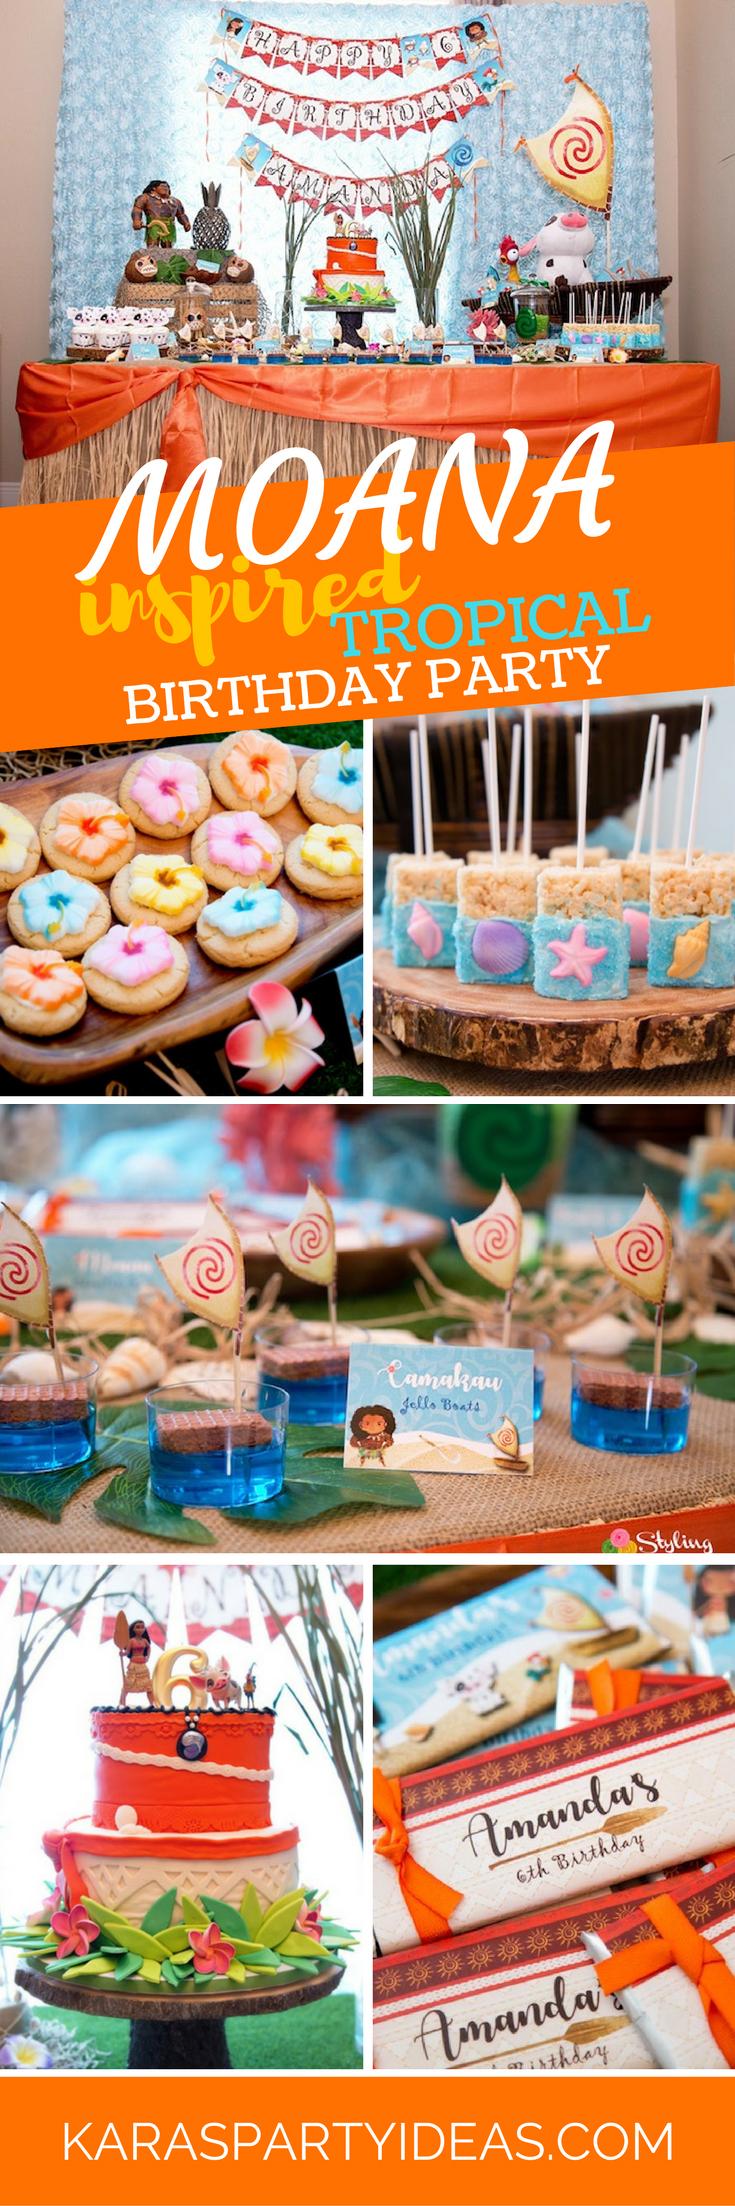 Moana Inspired Tropical Birthday Party via Kara's Party Ideas - KarasPartyIdeas.com